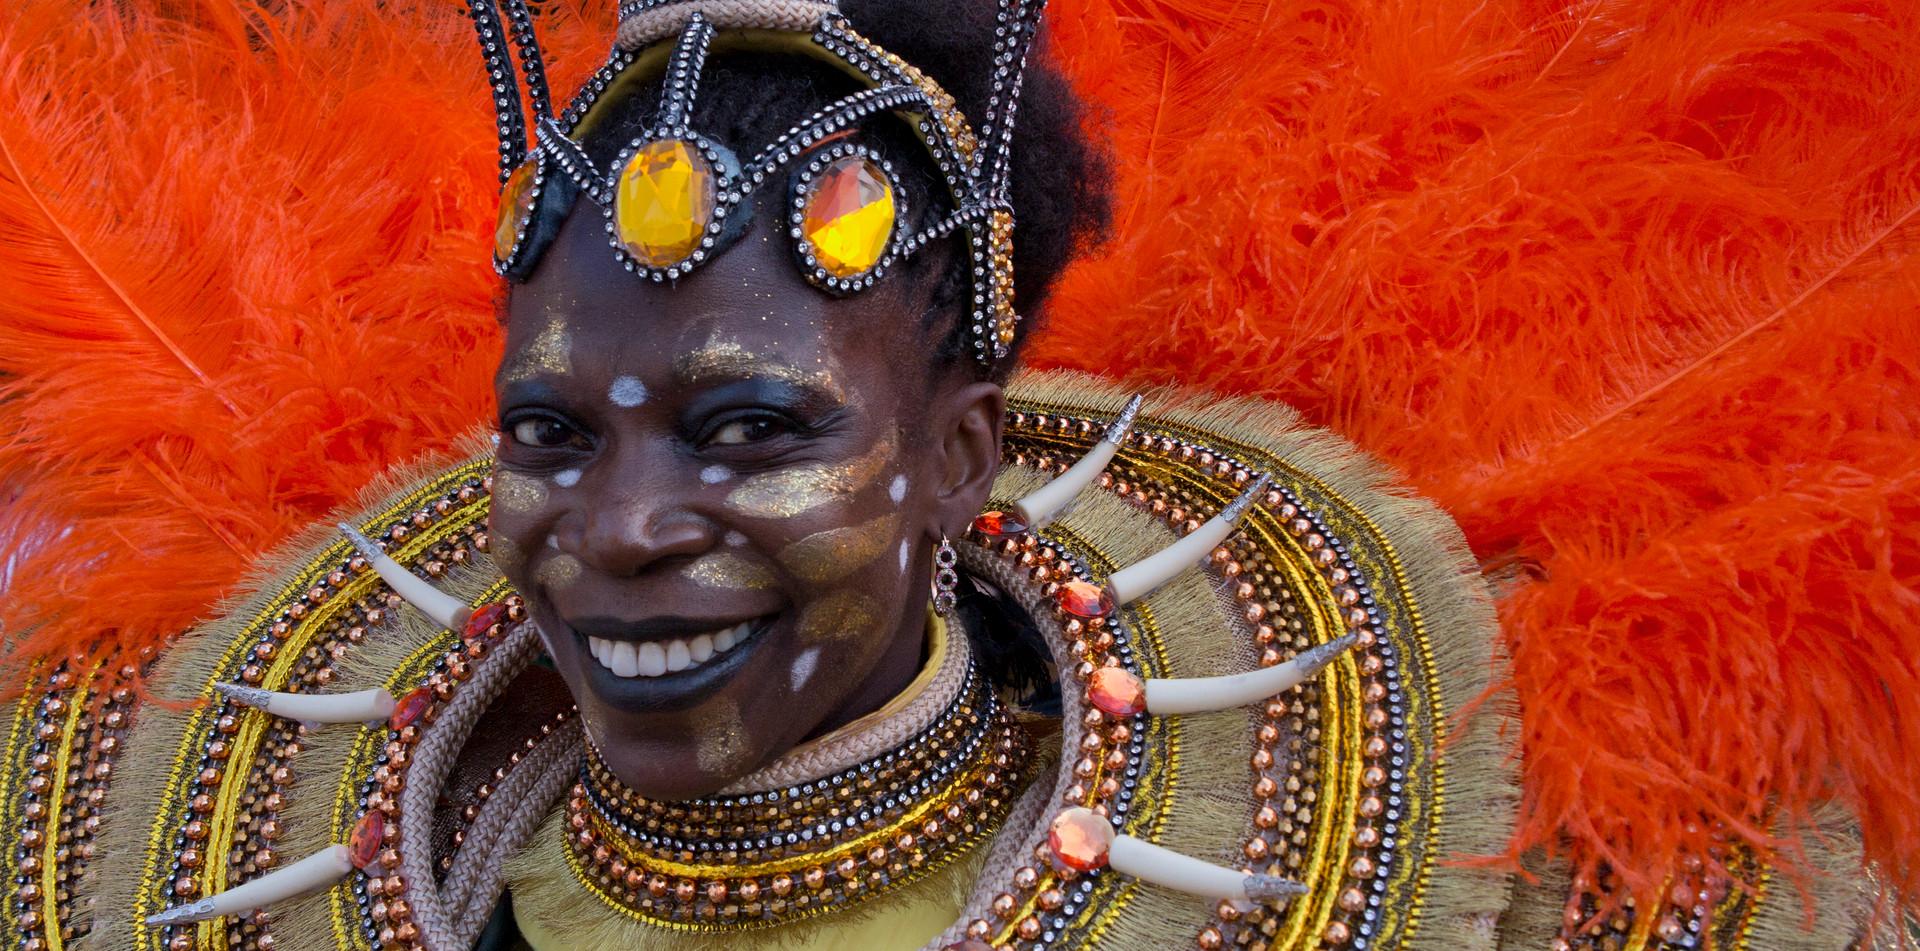 African Brazilian dancer rehearsing for carnival in Rio